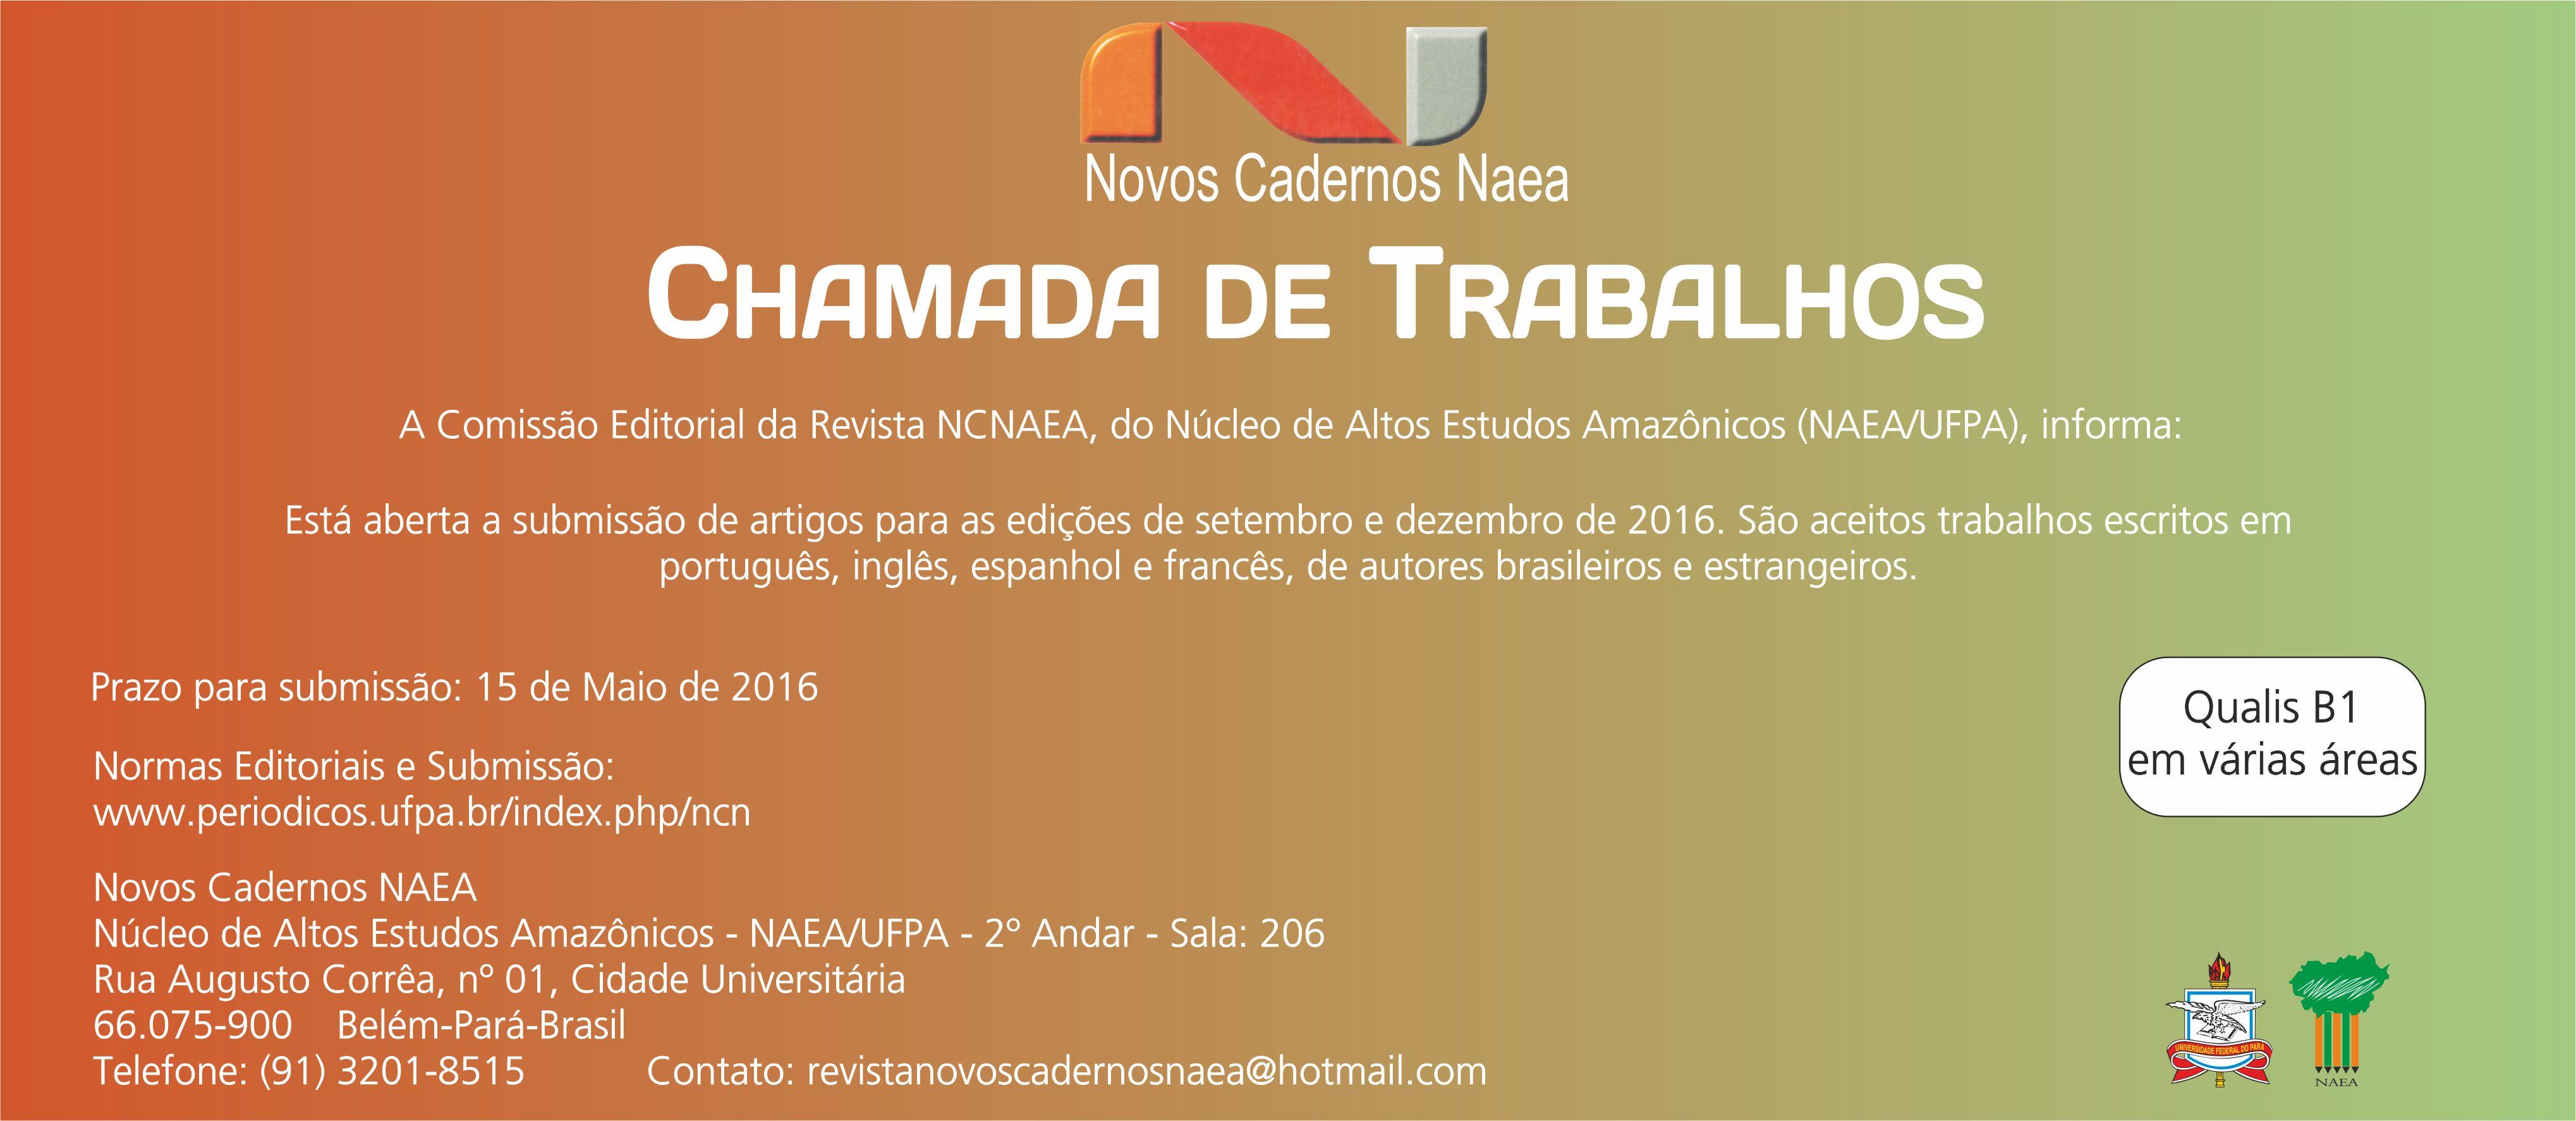 Revista Novos Cadernos NAEA_28abr2016